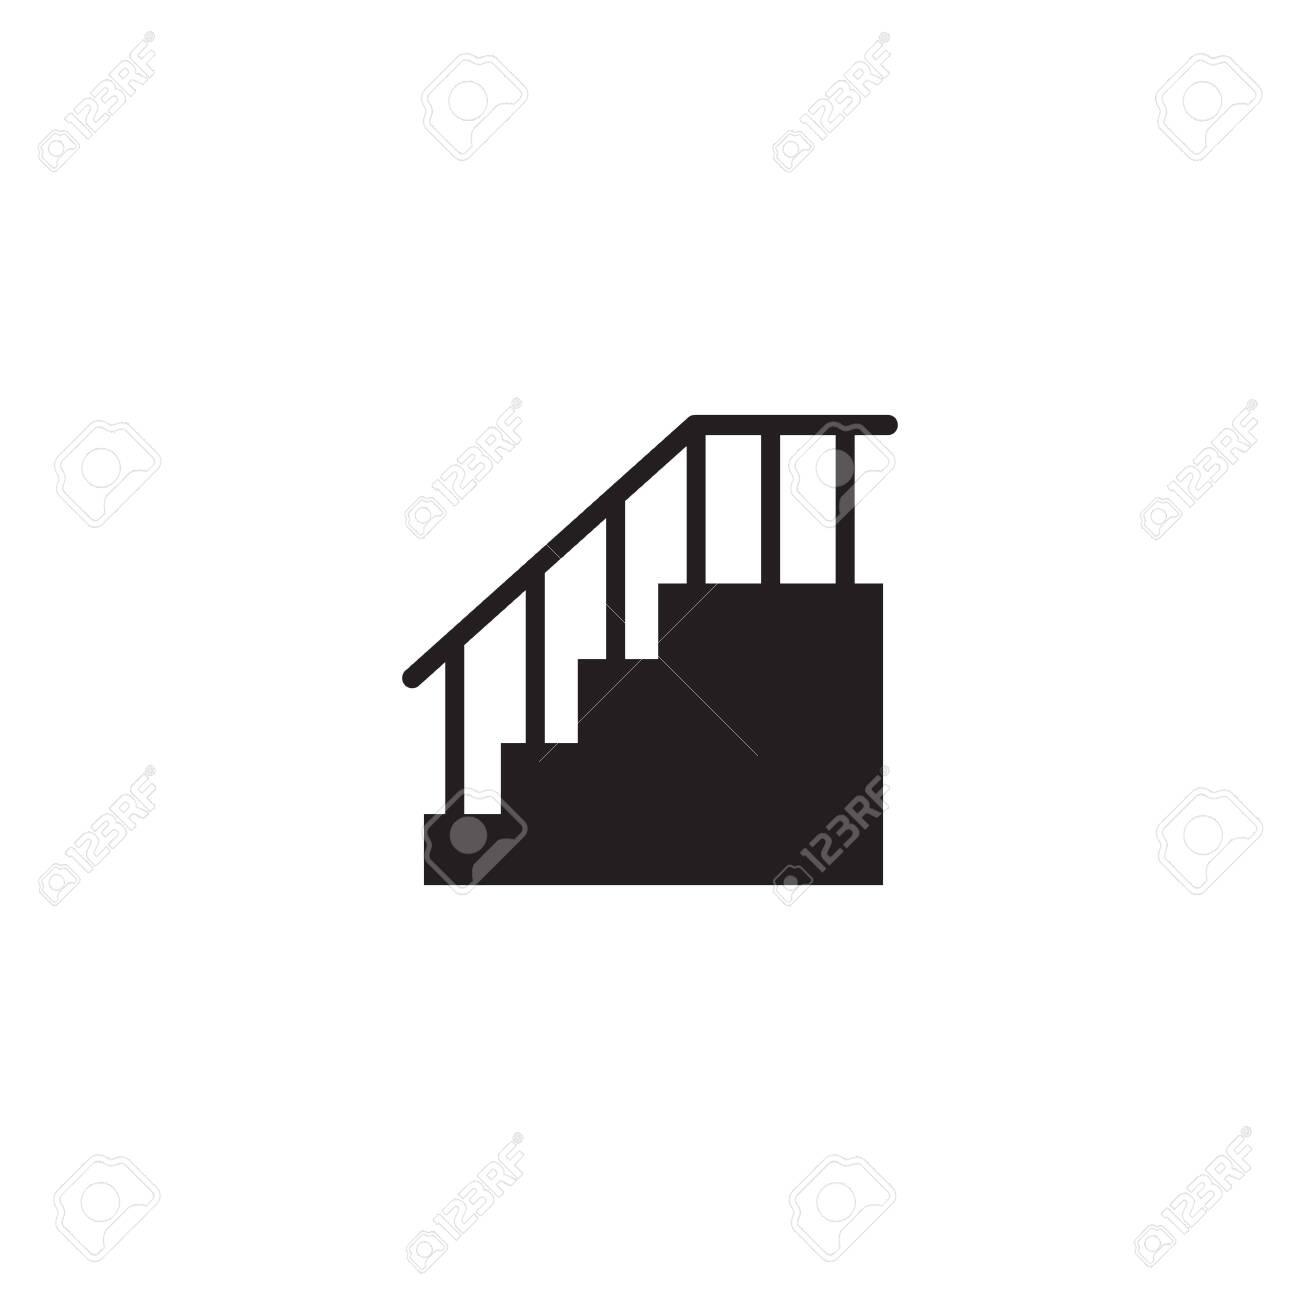 Stair icon logo design icon vector illustration template - 141175273